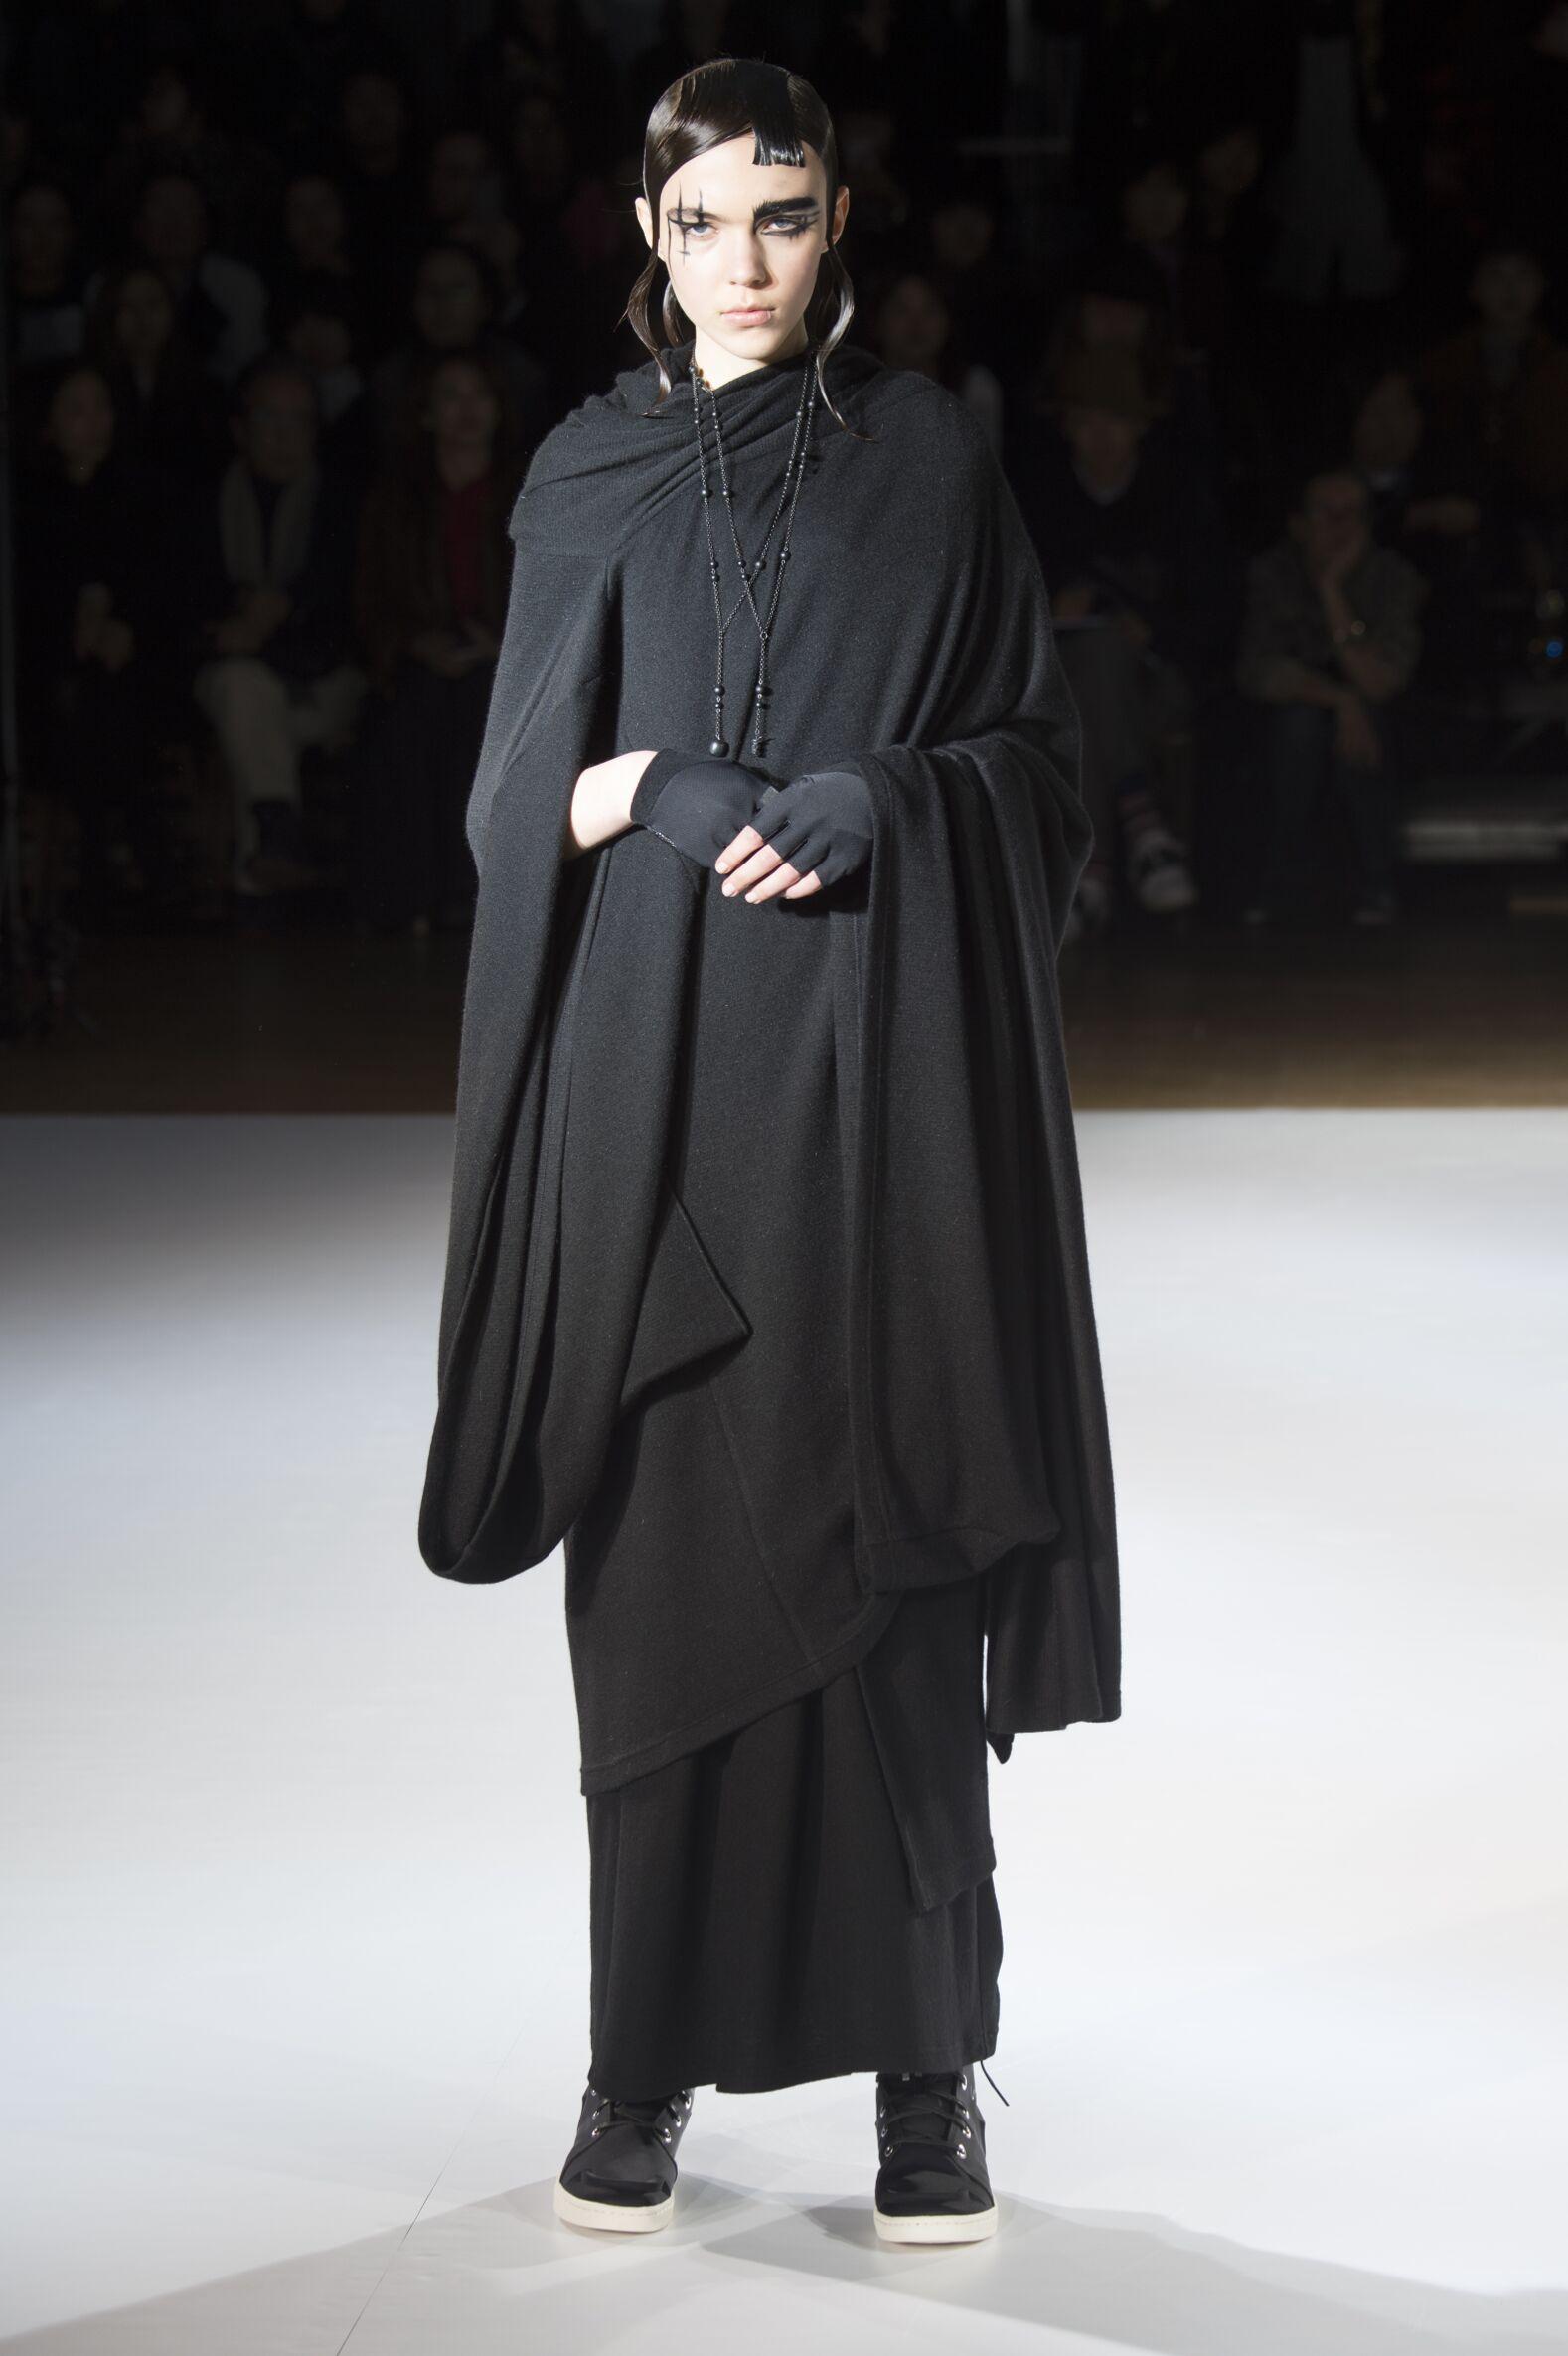 Yohji Yamamoto Collection Woman Paris Fashion Week